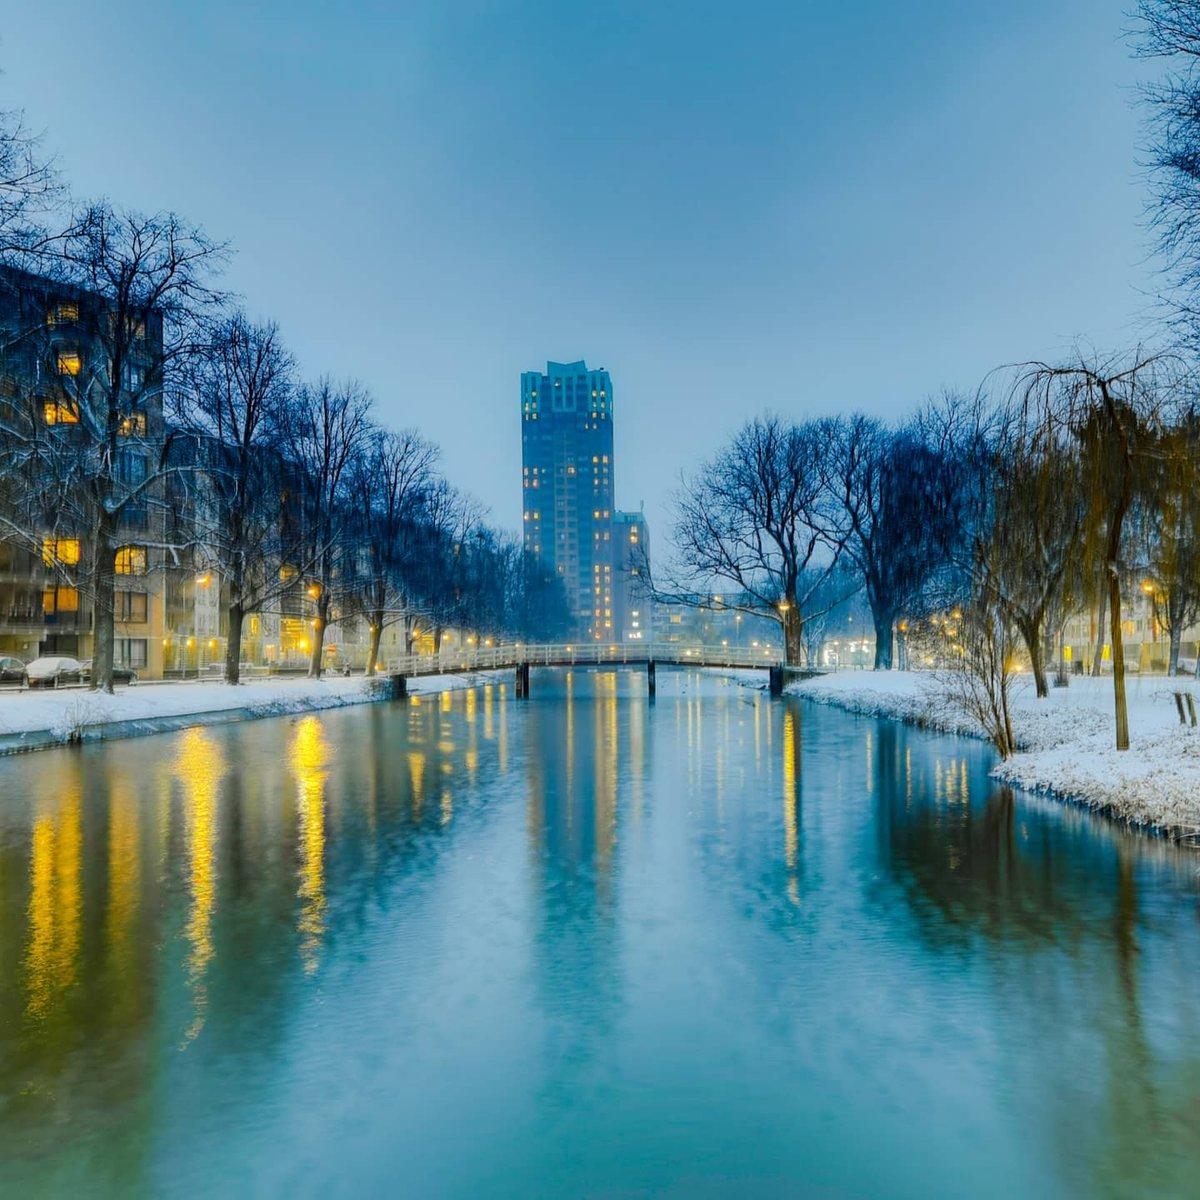 City with Winterland theme / La vie avec un thème de Winterland #winter #Rotterdam #snow #Netherlands #photography #photos #photooftheday